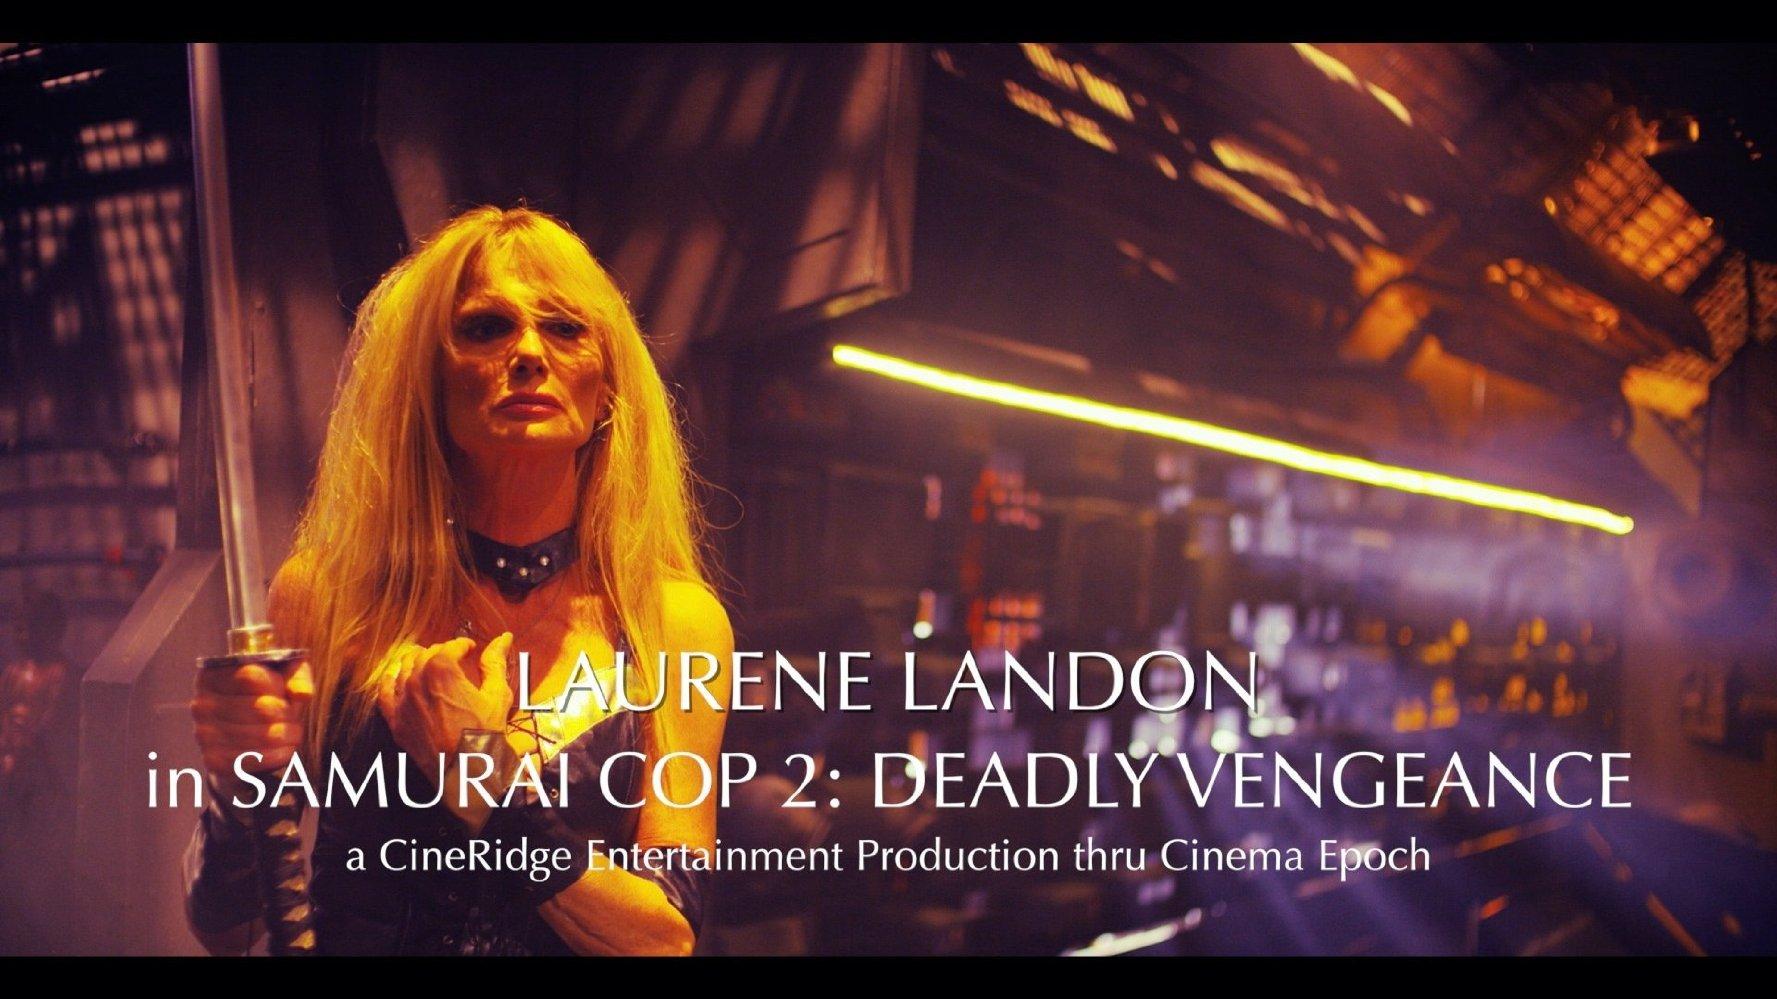 Laurene Landon